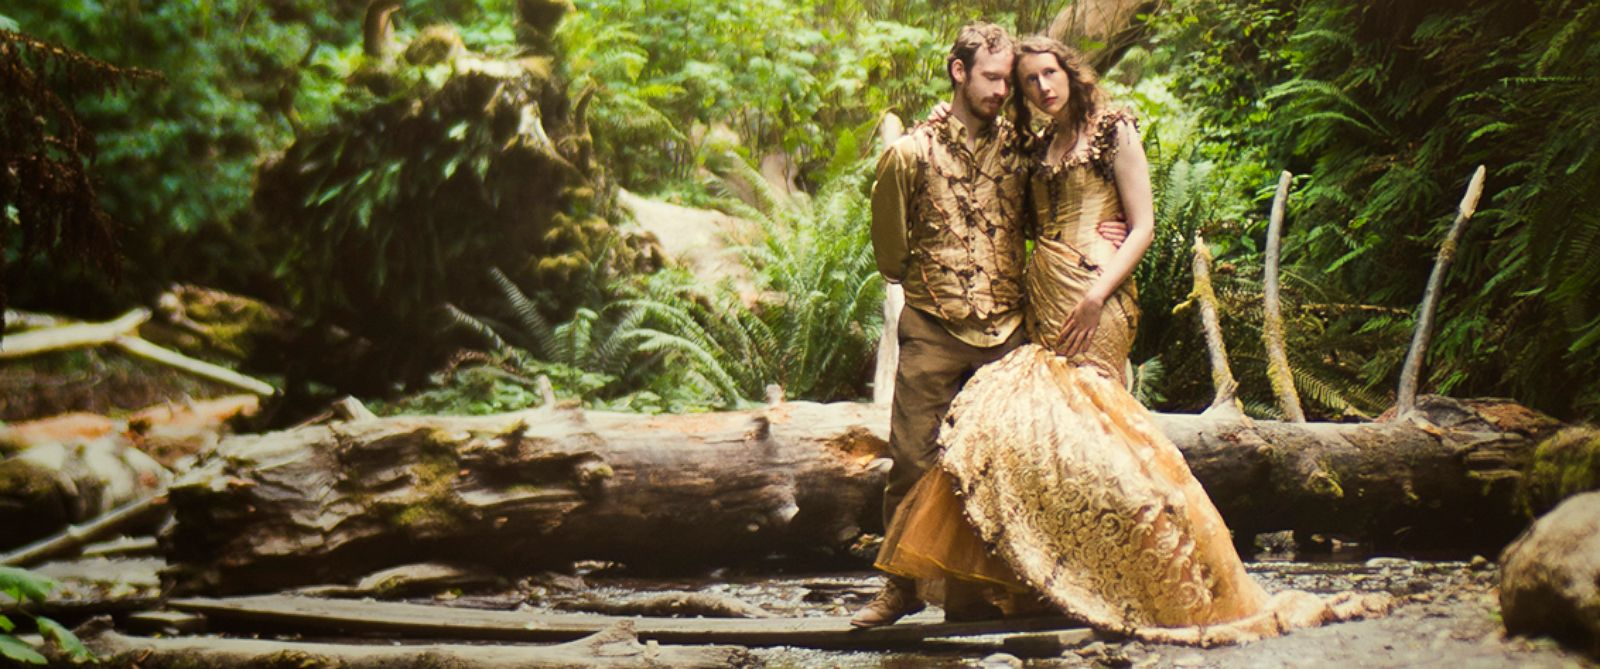 story id woodland wedding dress PHOTO Harmony Lawrence or Portland Oregon spent six months creating her ornate